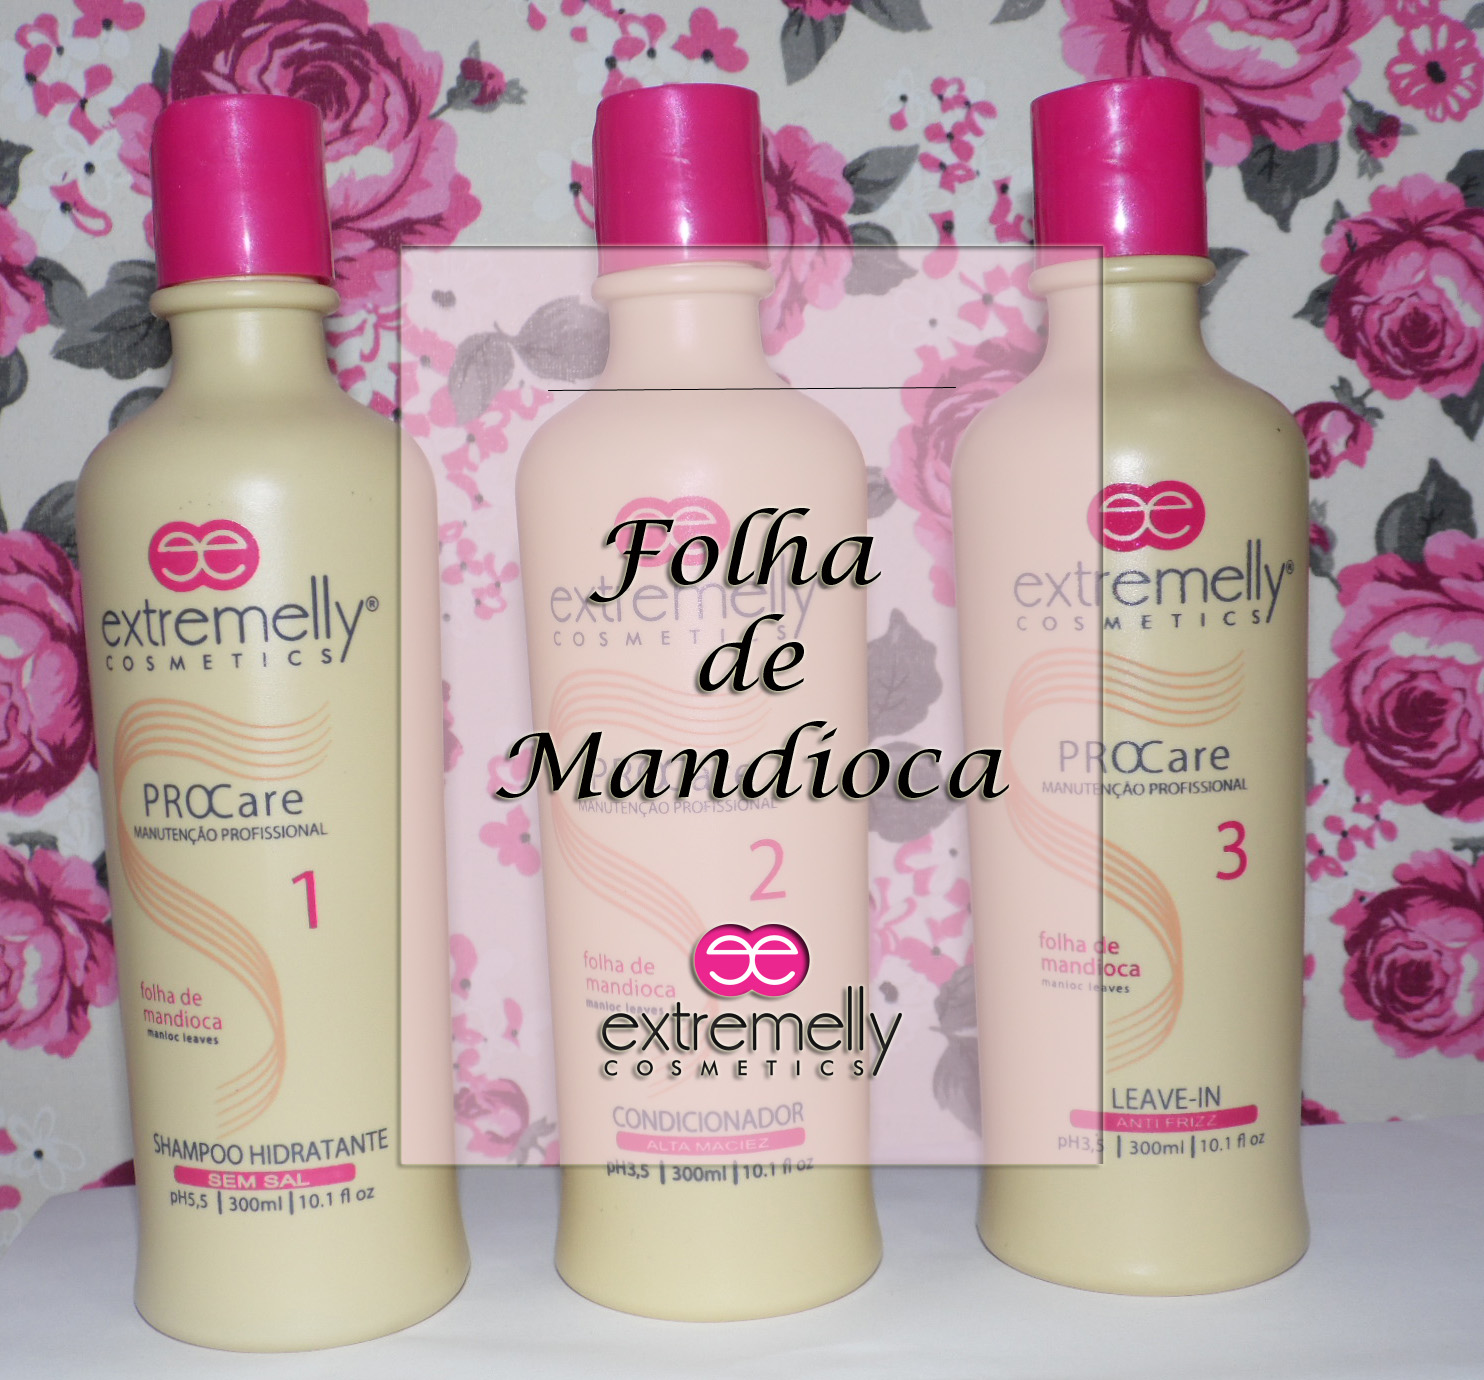 Folha de Mandioca extremelly